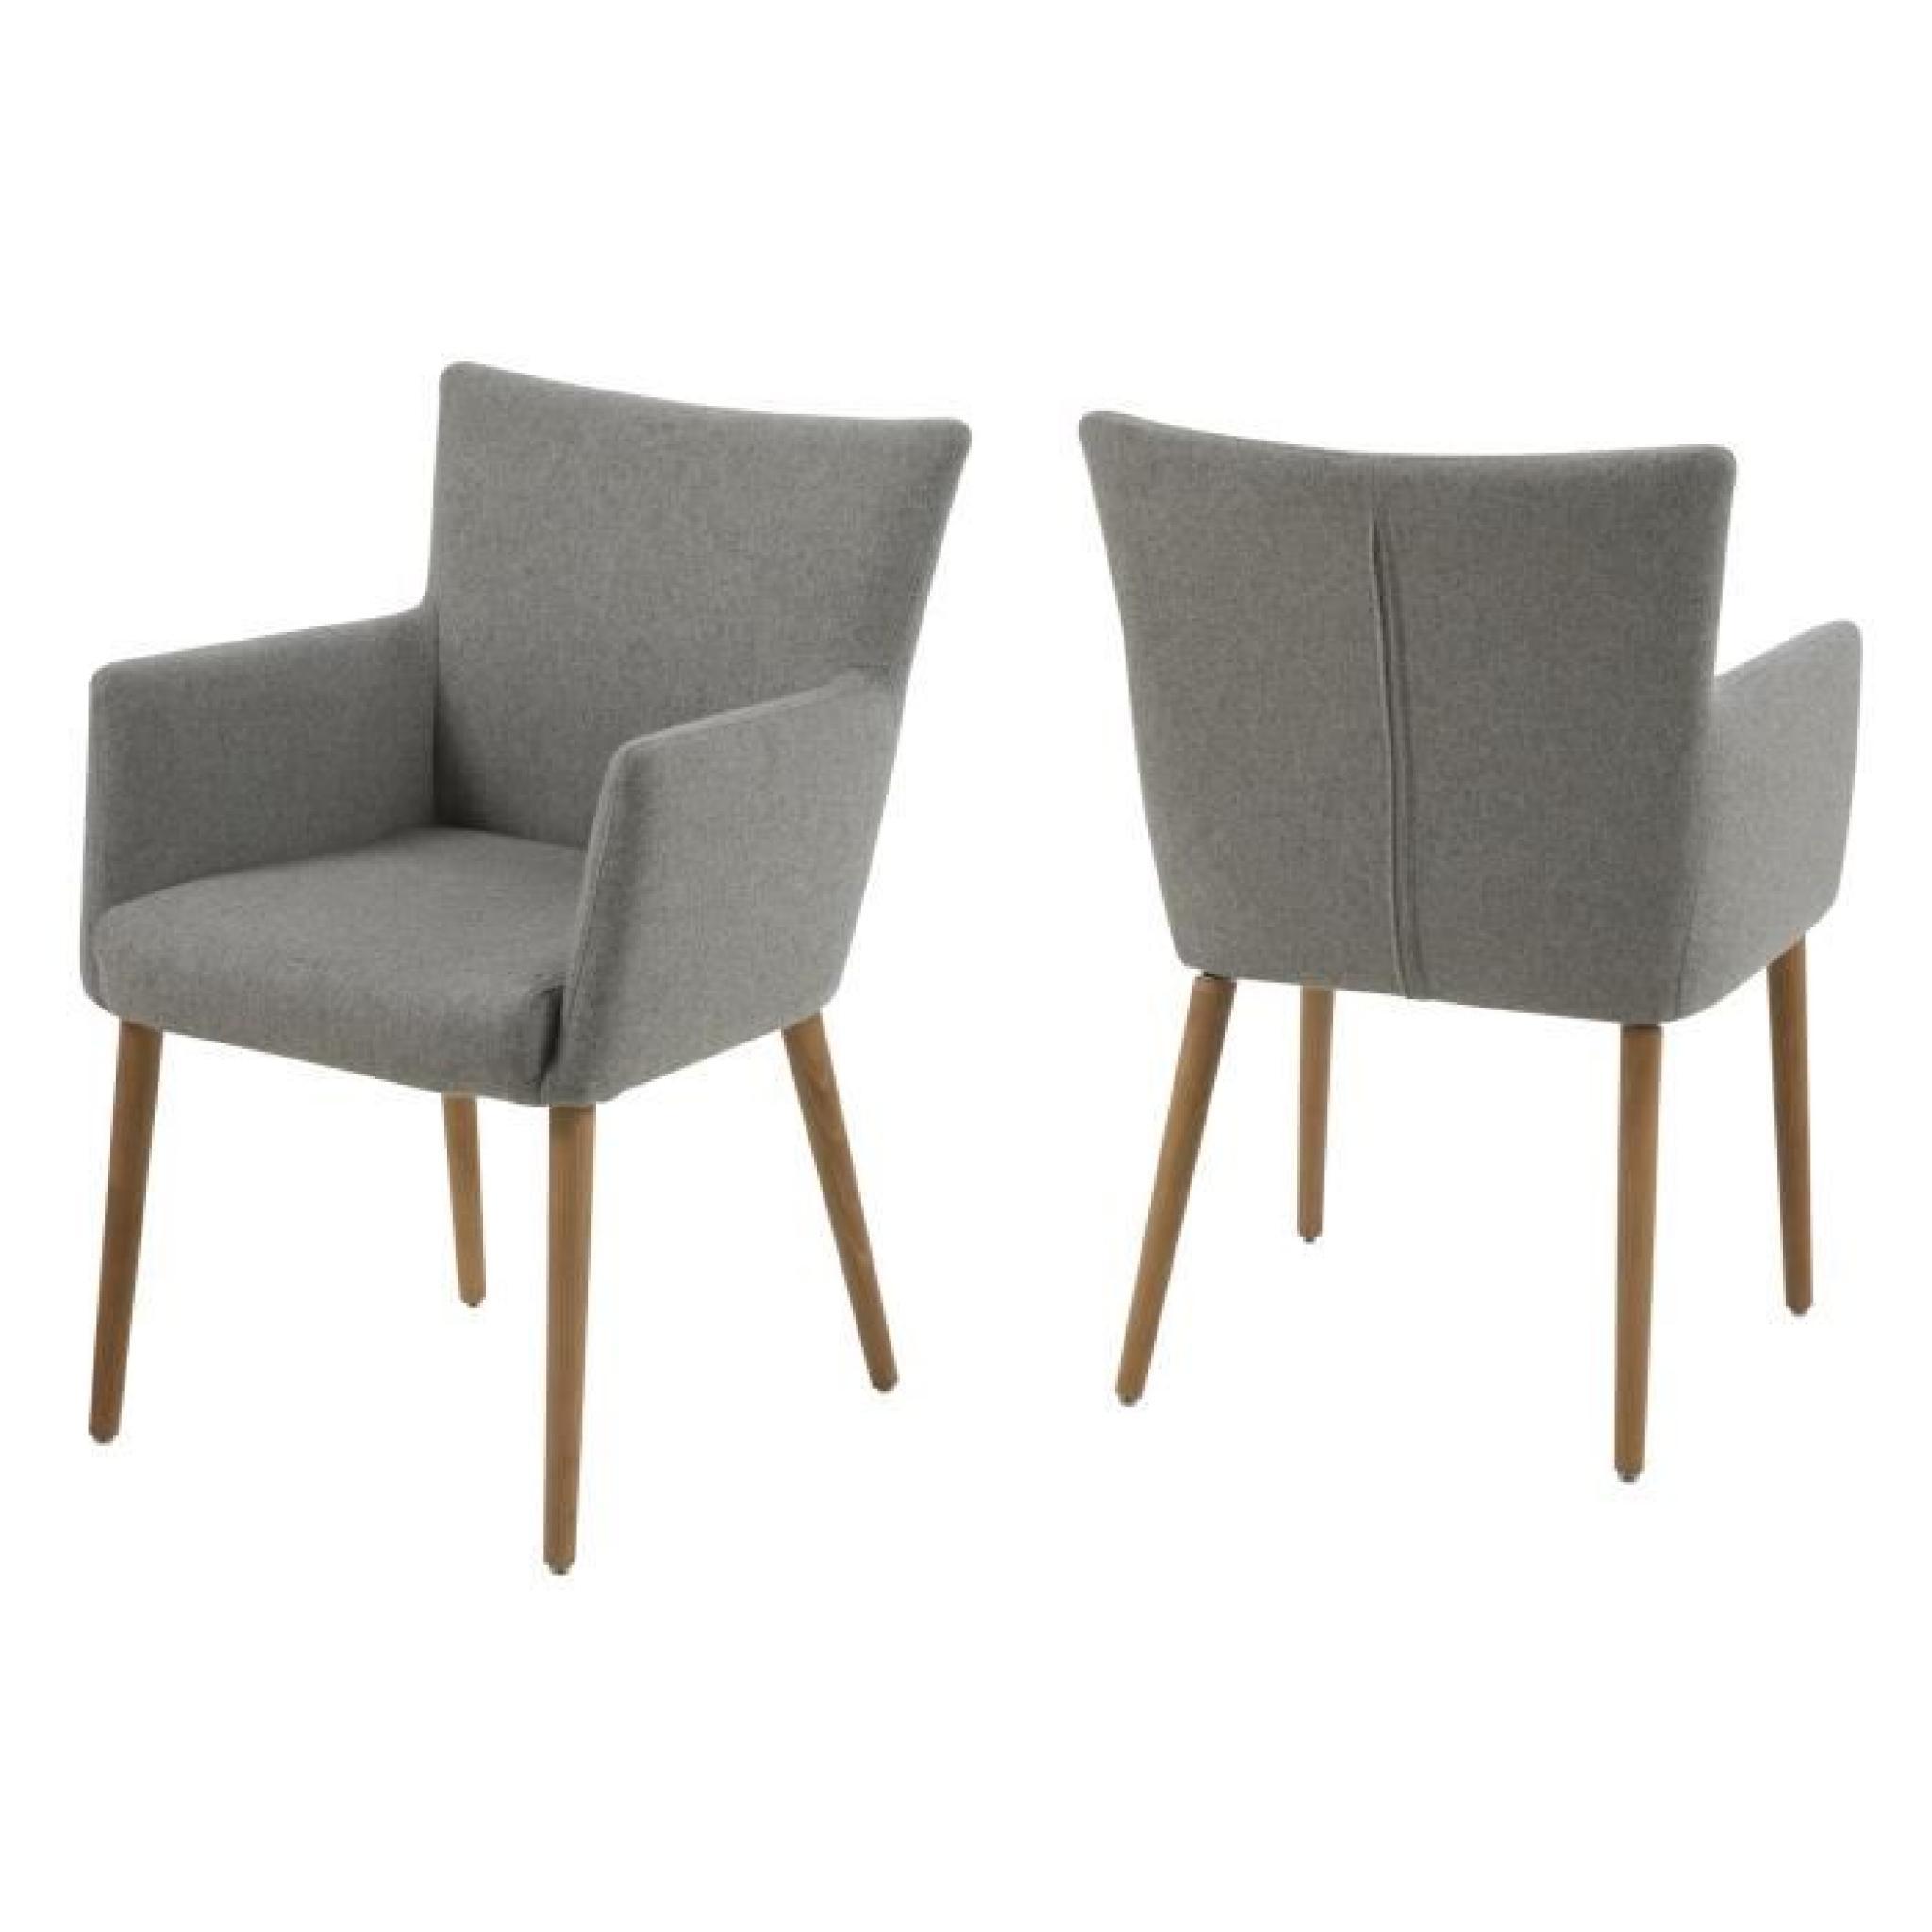 #674E36 Chaise De Salle à Manger NELLIE En Tissu Avec Acco Achat  4257 chaise de salle à manger pas cher design 2048x2048 px @ aertt.com